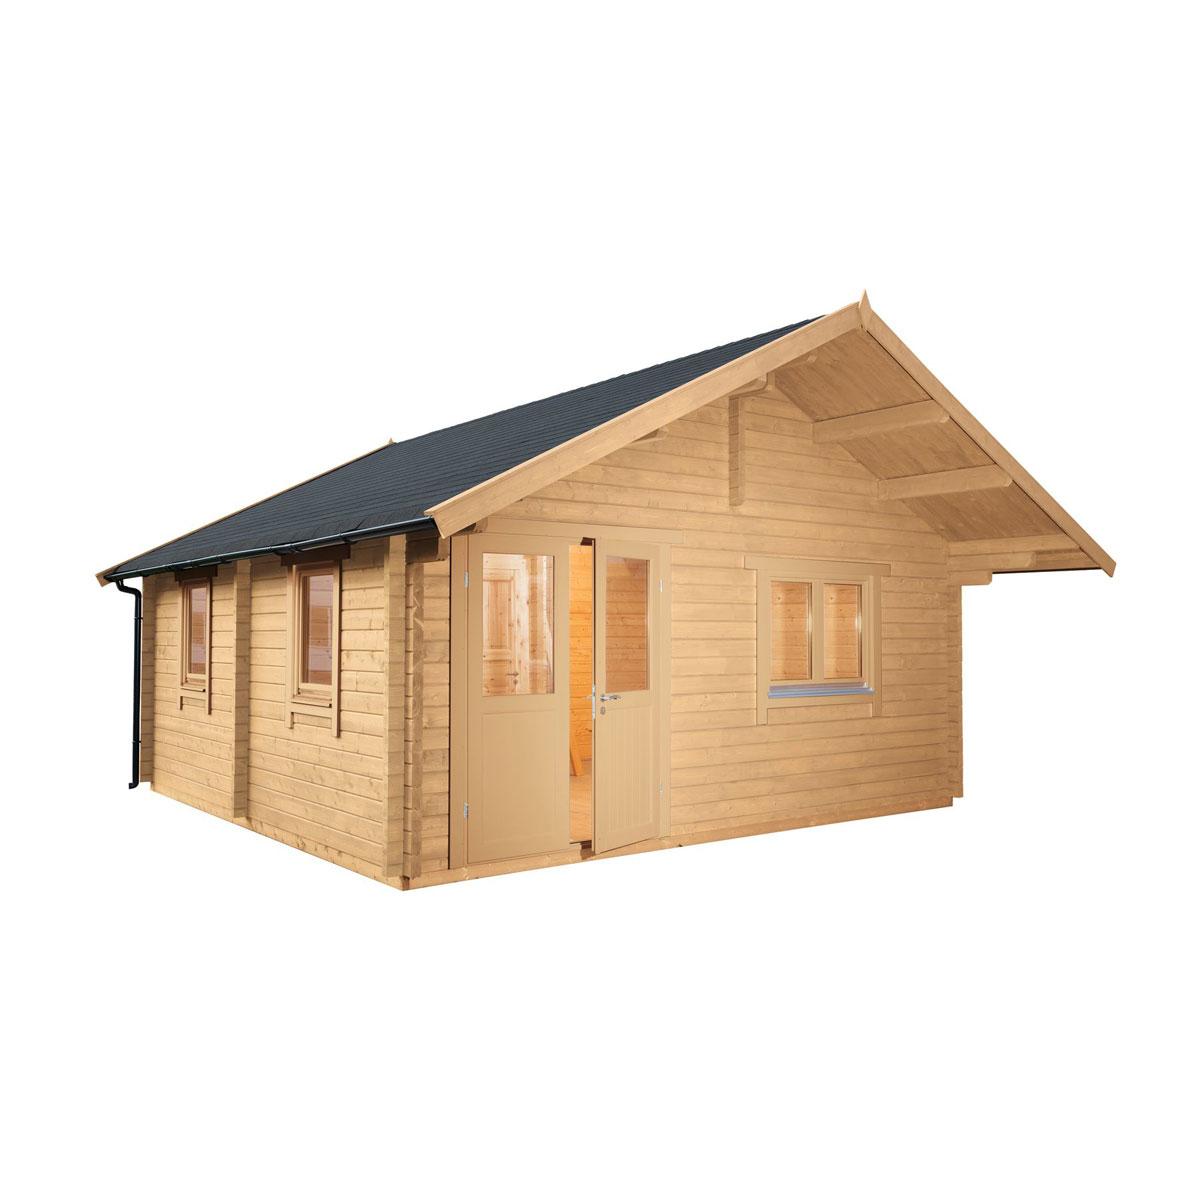 "Gartenhäuser - Gartenhaus ""Lappland 70 B"", XL, mit Schlafboden  - Onlineshop Hellweg"